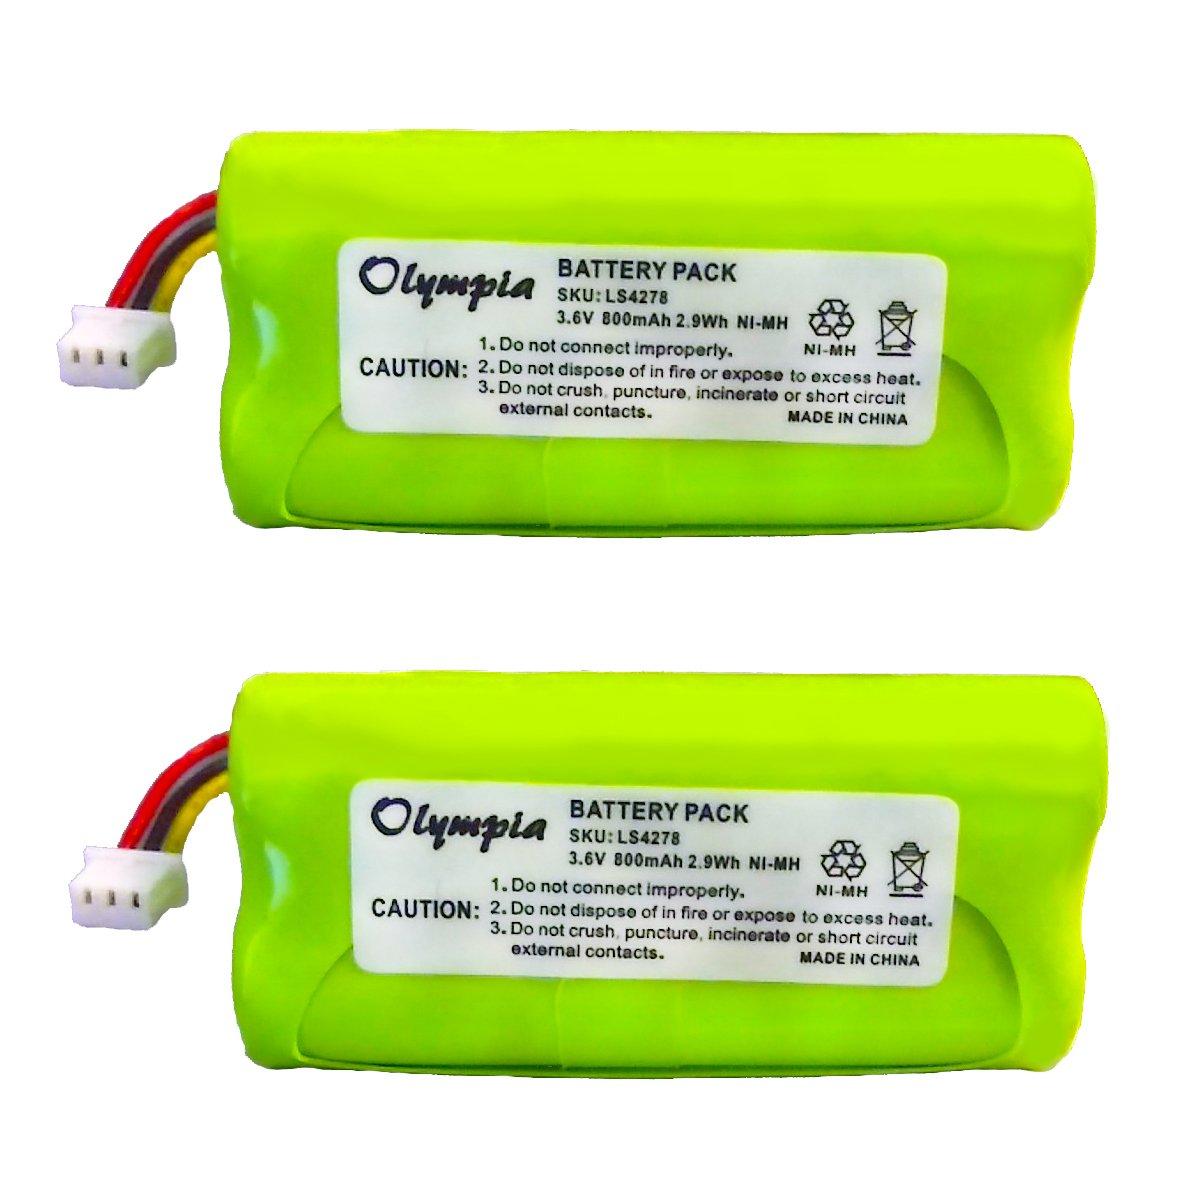 Amazon 2 pack of motorola symbol ls4278 battery amazon 2 pack of motorola symbol ls4278 battery replacement for motorola symbol ls4278 barcode scanner battery 800mah 36v ni mh electronics biocorpaavc Images